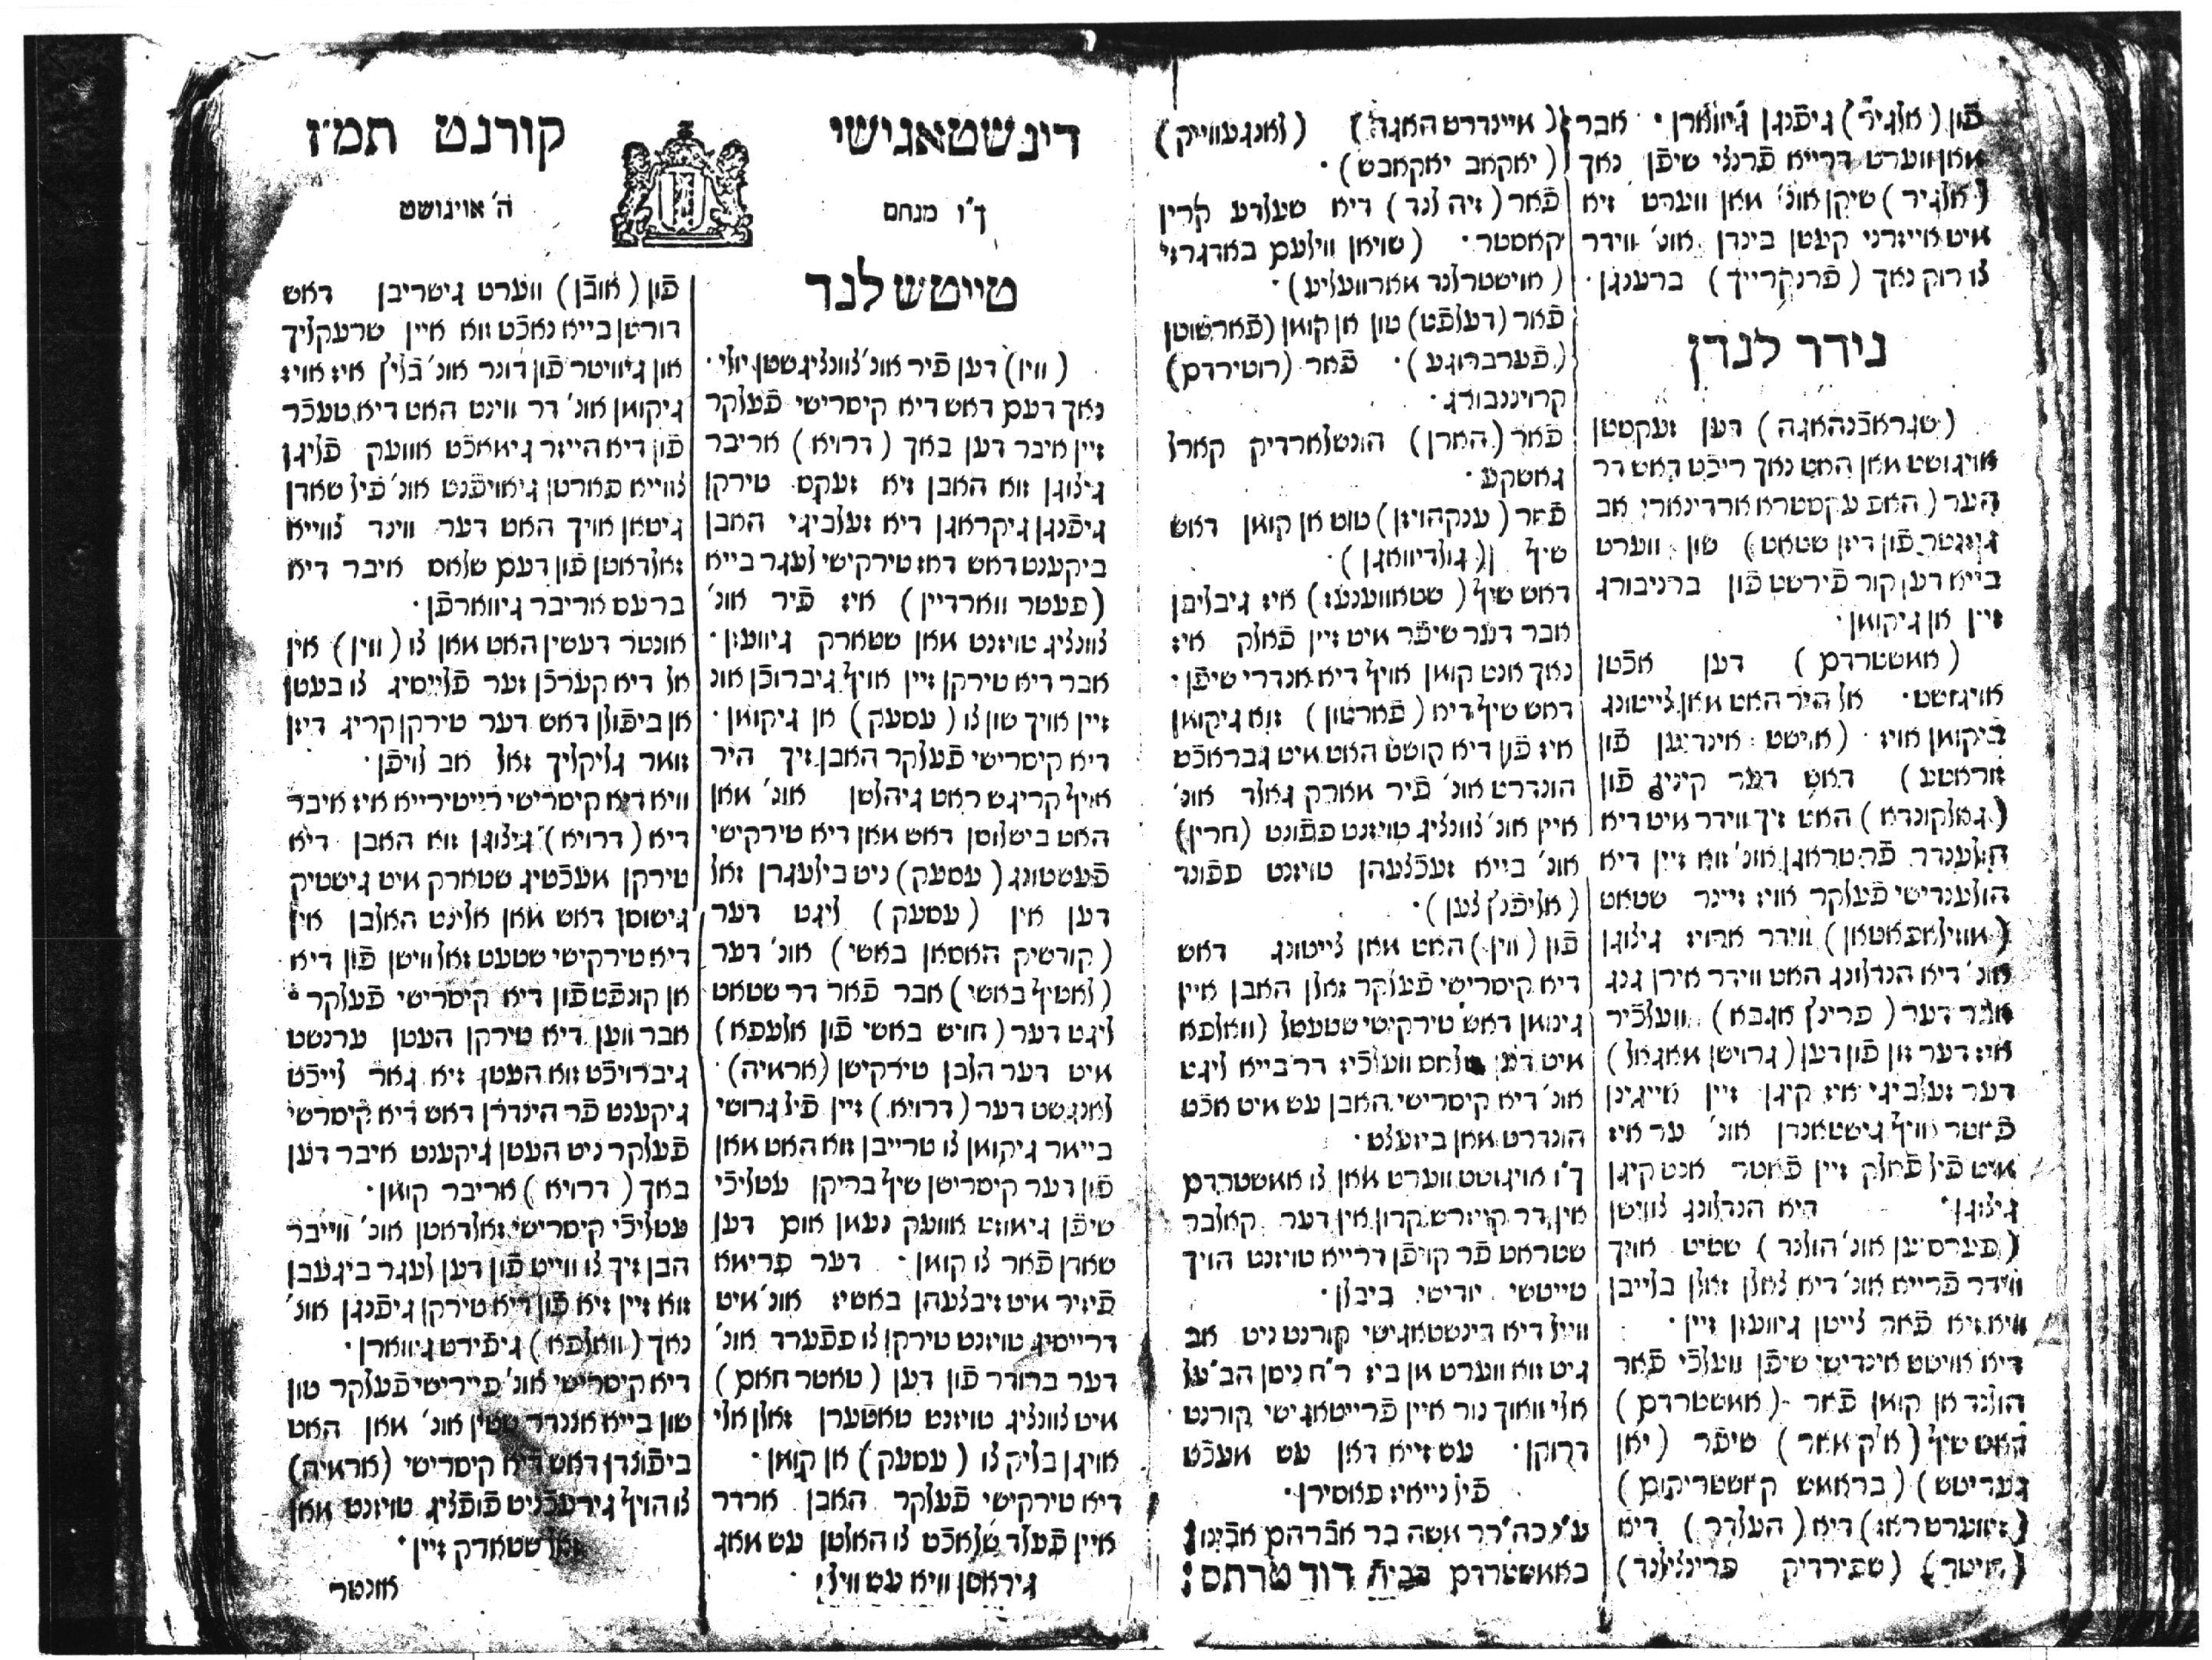 Artikelen Pagina 13 Van 16 Hilde Pach